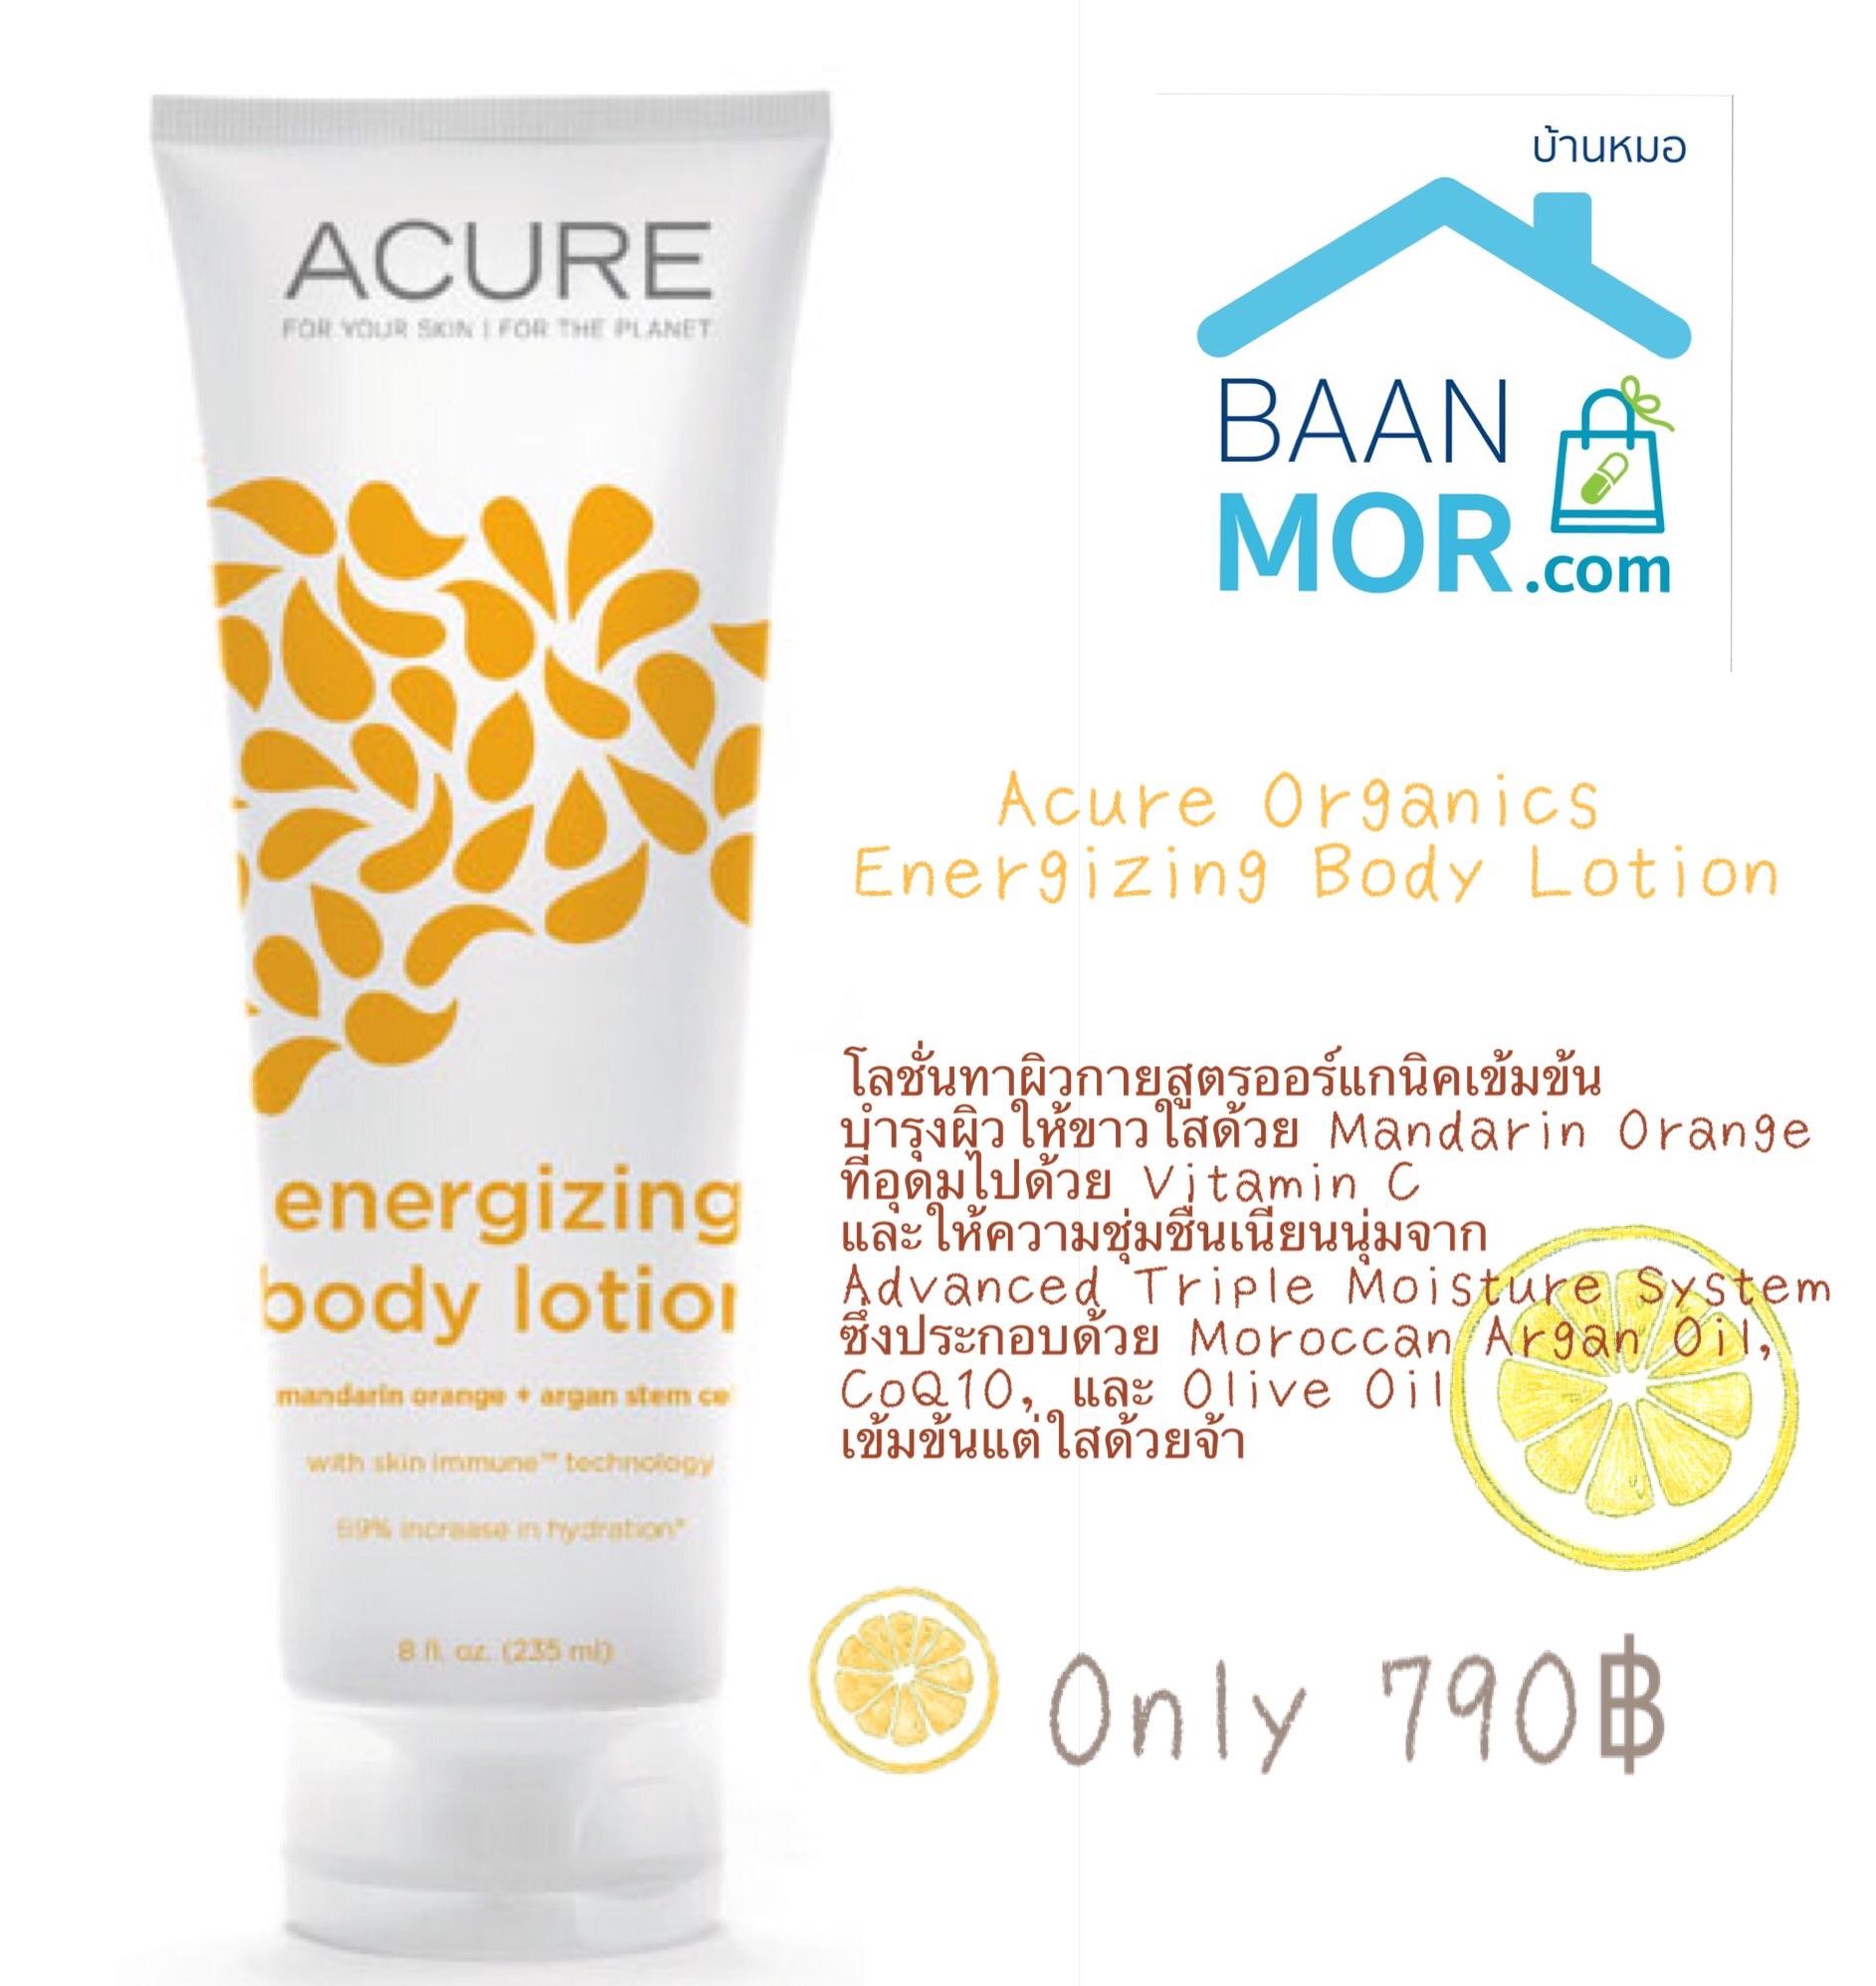 Acure Organics โลชั่นทาผิวกายสูตรออร์แกนิคเข้มข้น บำรุงผิวให้ขาวใสด้วย Mandarin Orange ที่อุดมไปด้วยวิตามินซี และให้ความชุ้มชื่นเนียนนุ่มด้วย Moroccan Argan Stem Cell